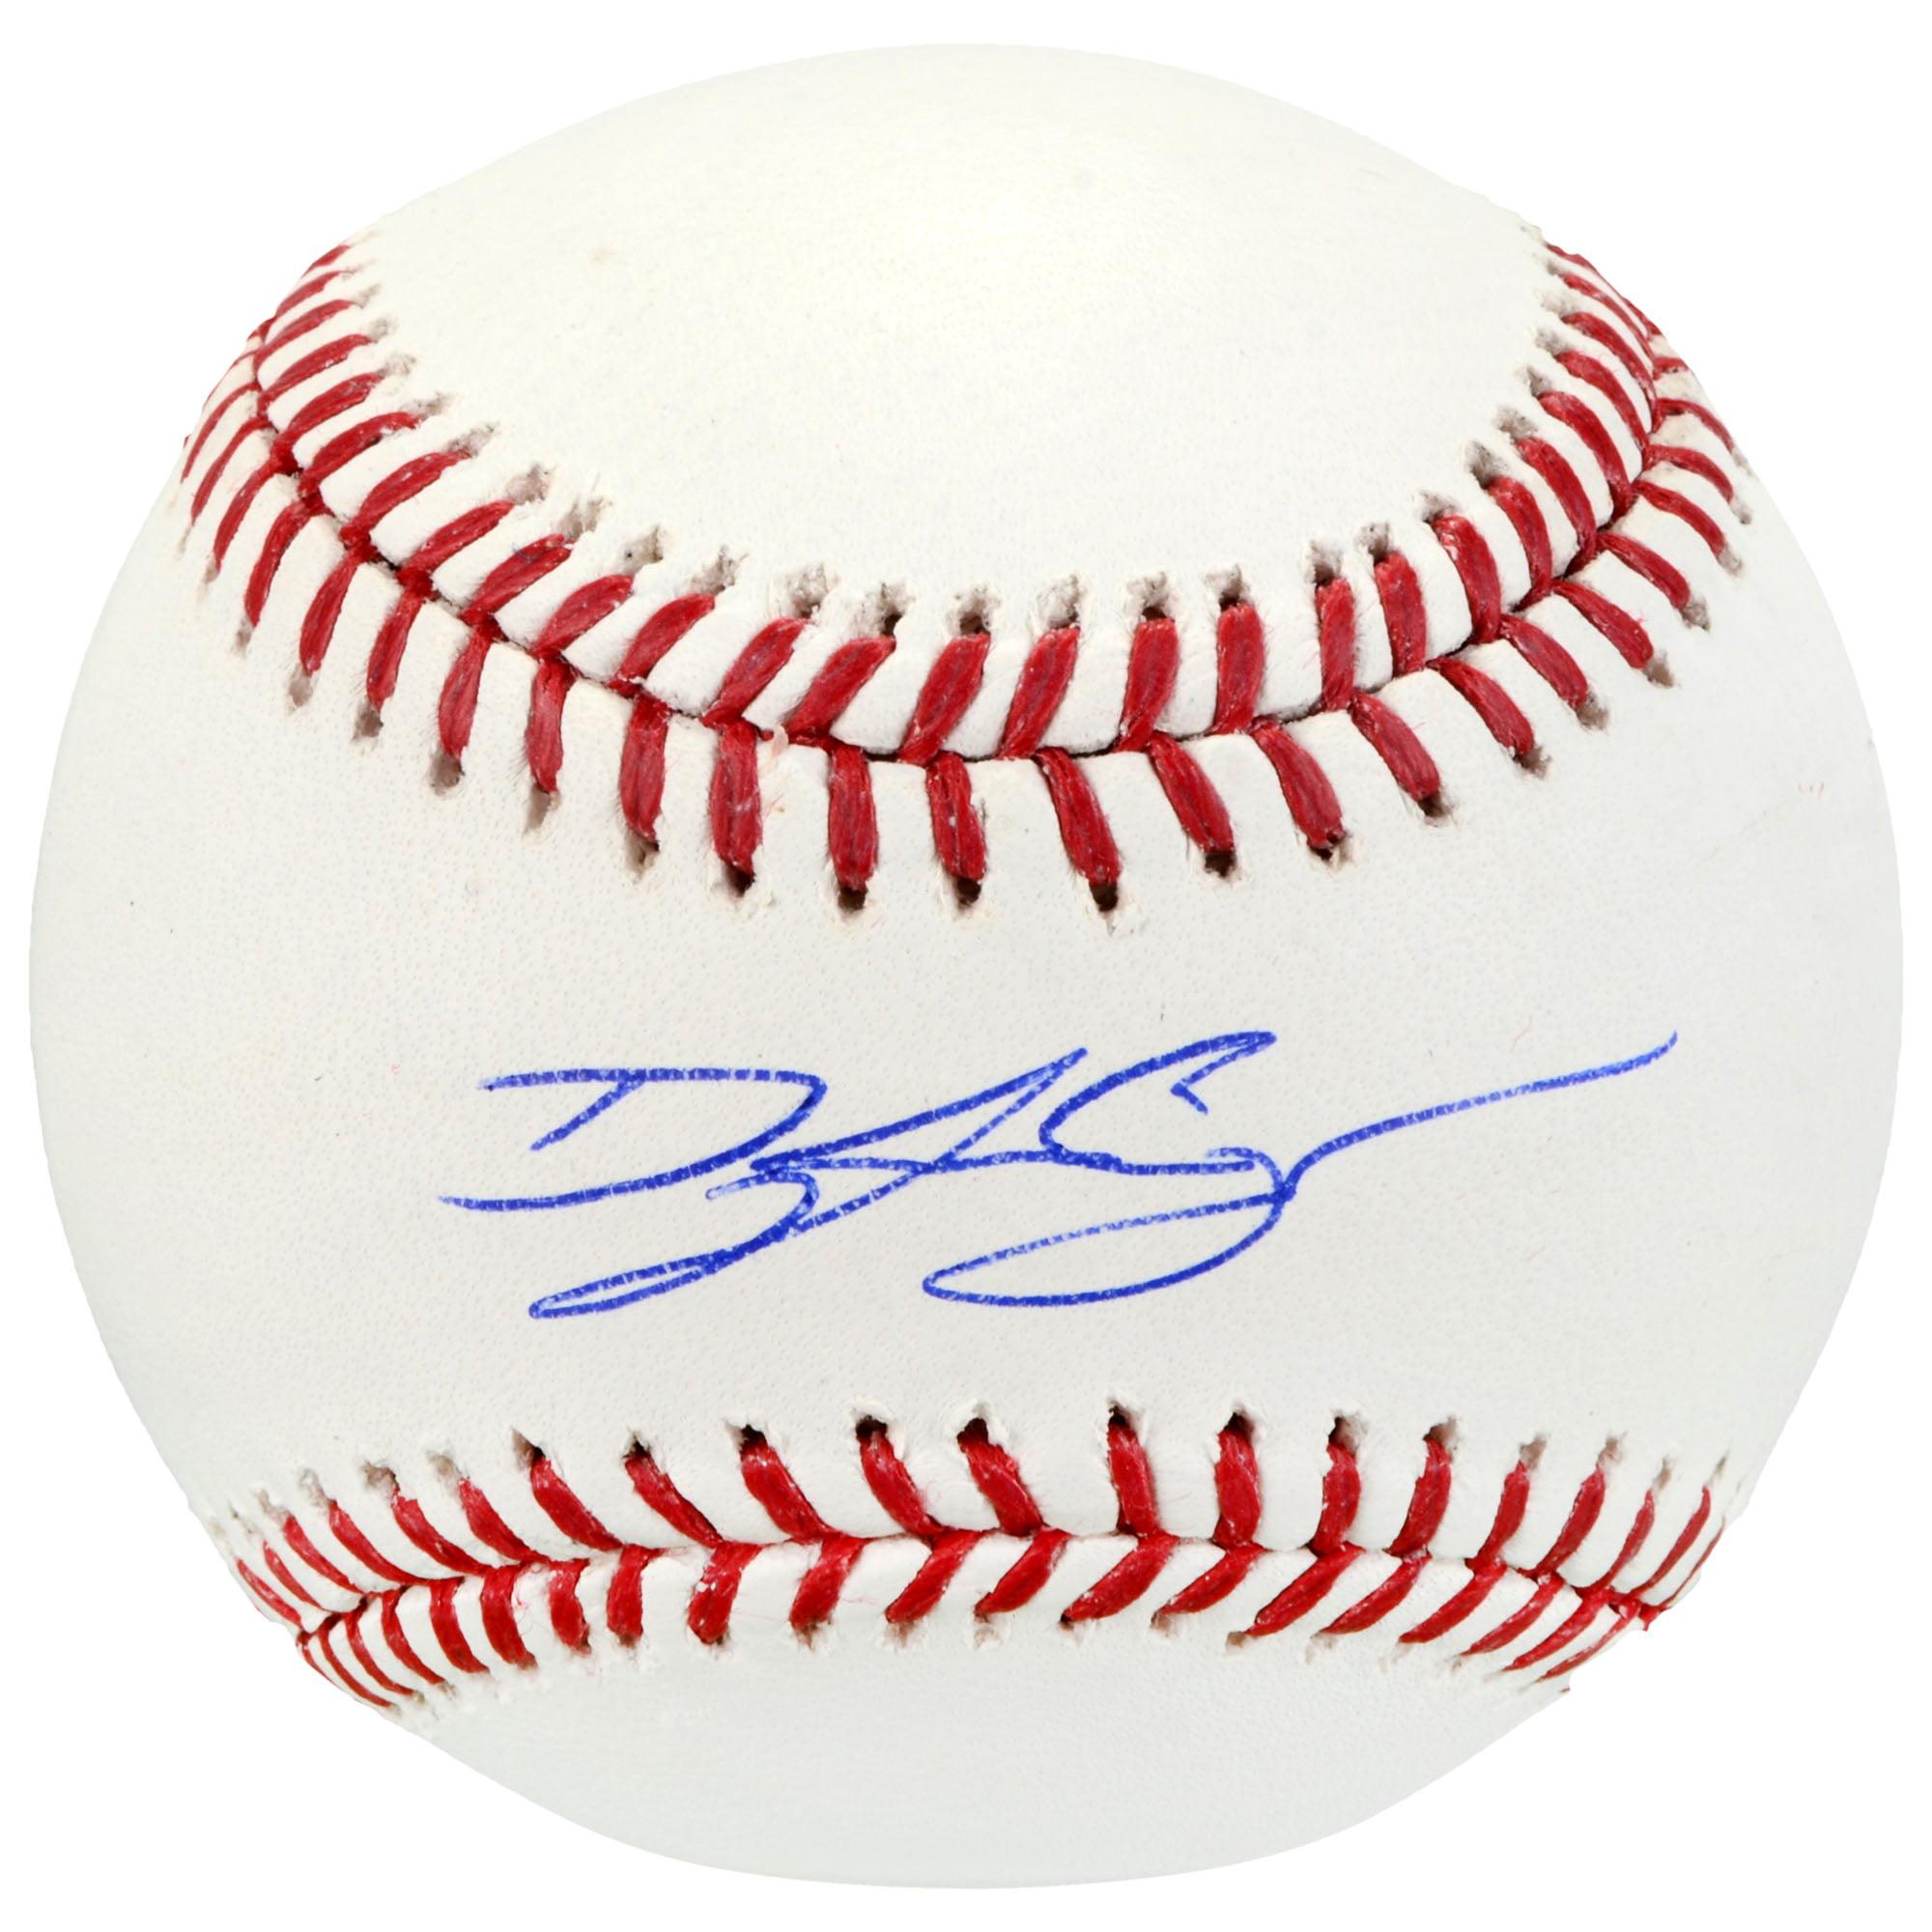 Dylan Cozens Philadelphia Phillies Fanatics Authentic Autographed Baseball - No Size